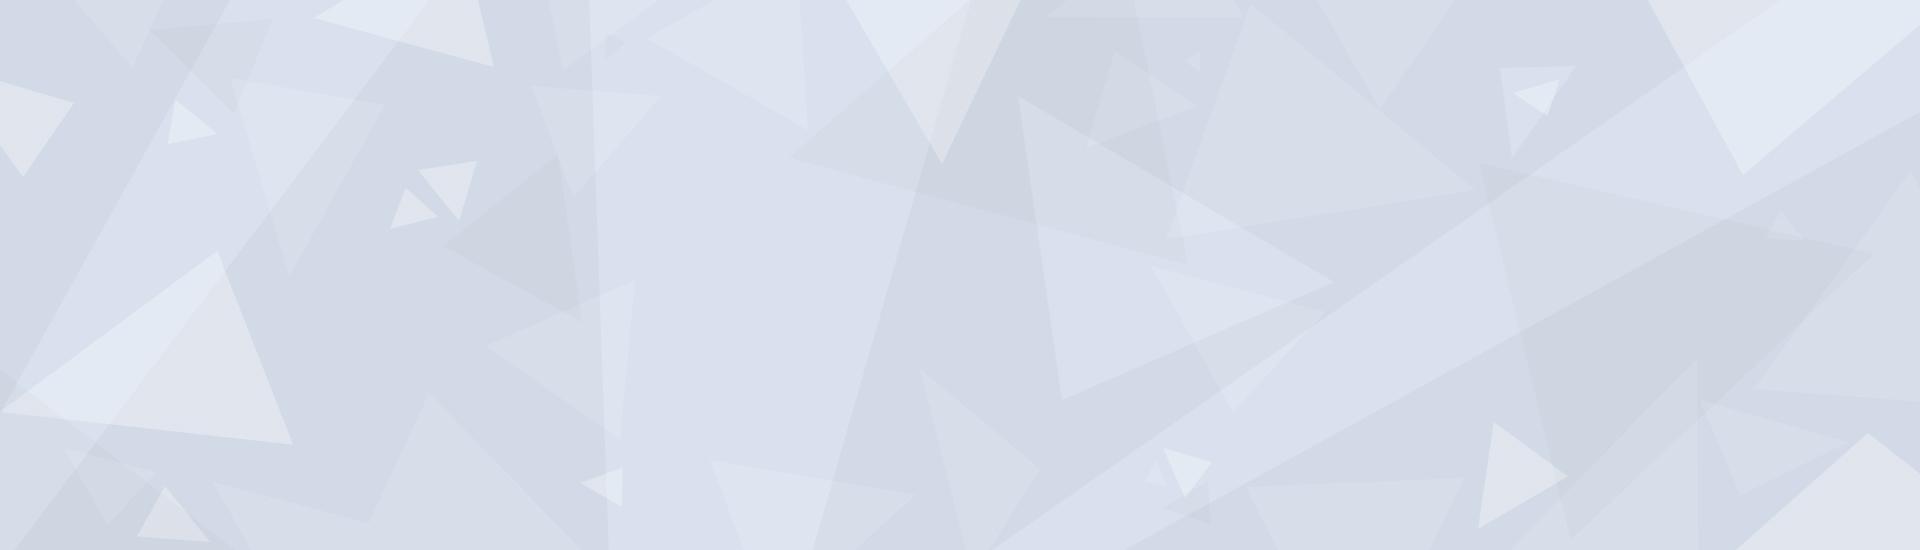 K_ken_kaneki - VSLeague Online eSport